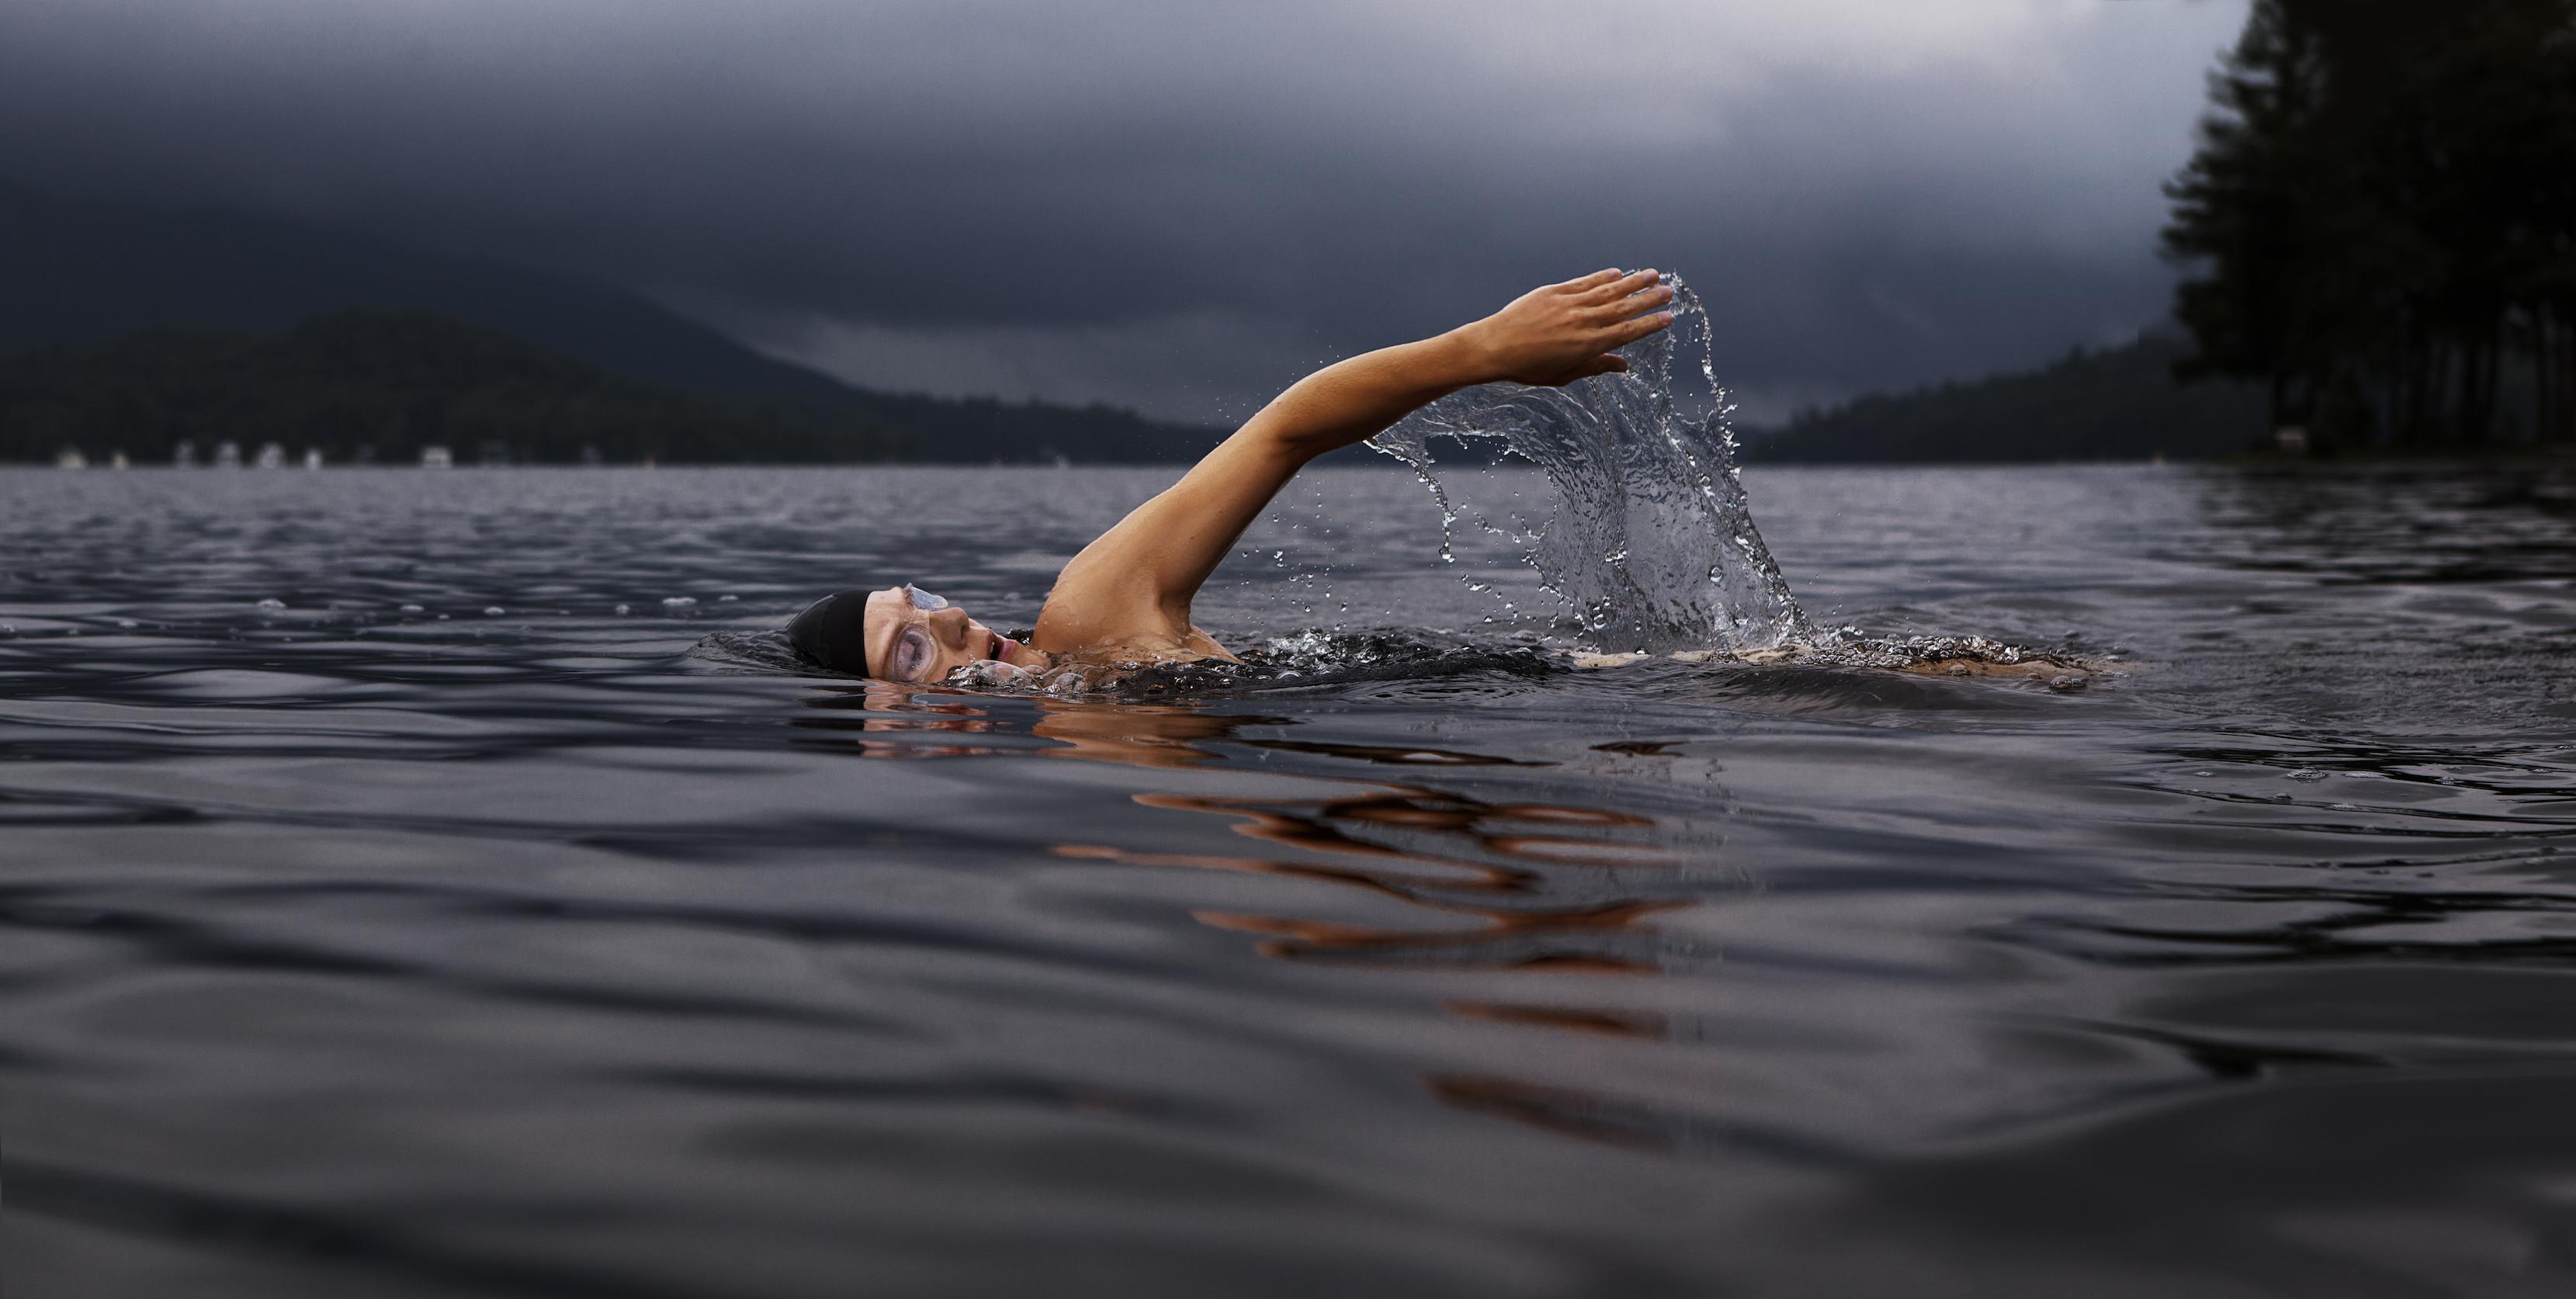 Serving swimmer